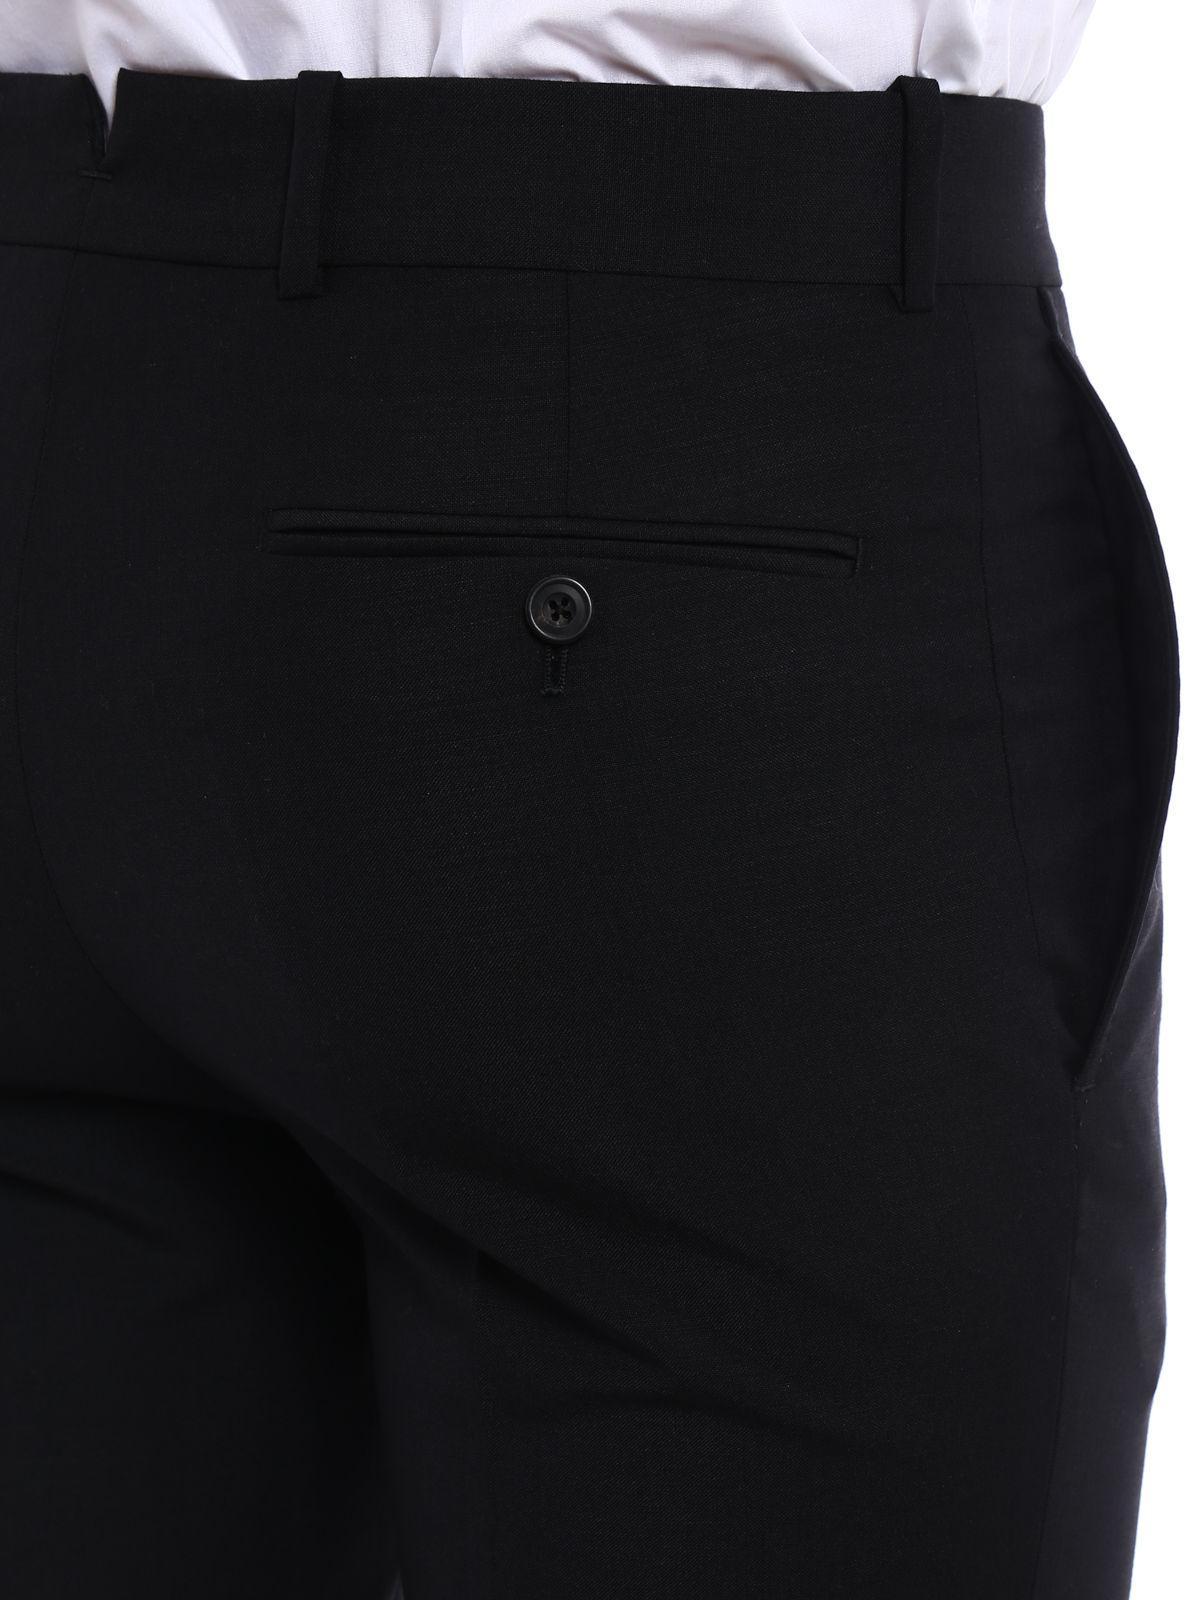 Alexander McQueen Wool Trousers in Black for Men